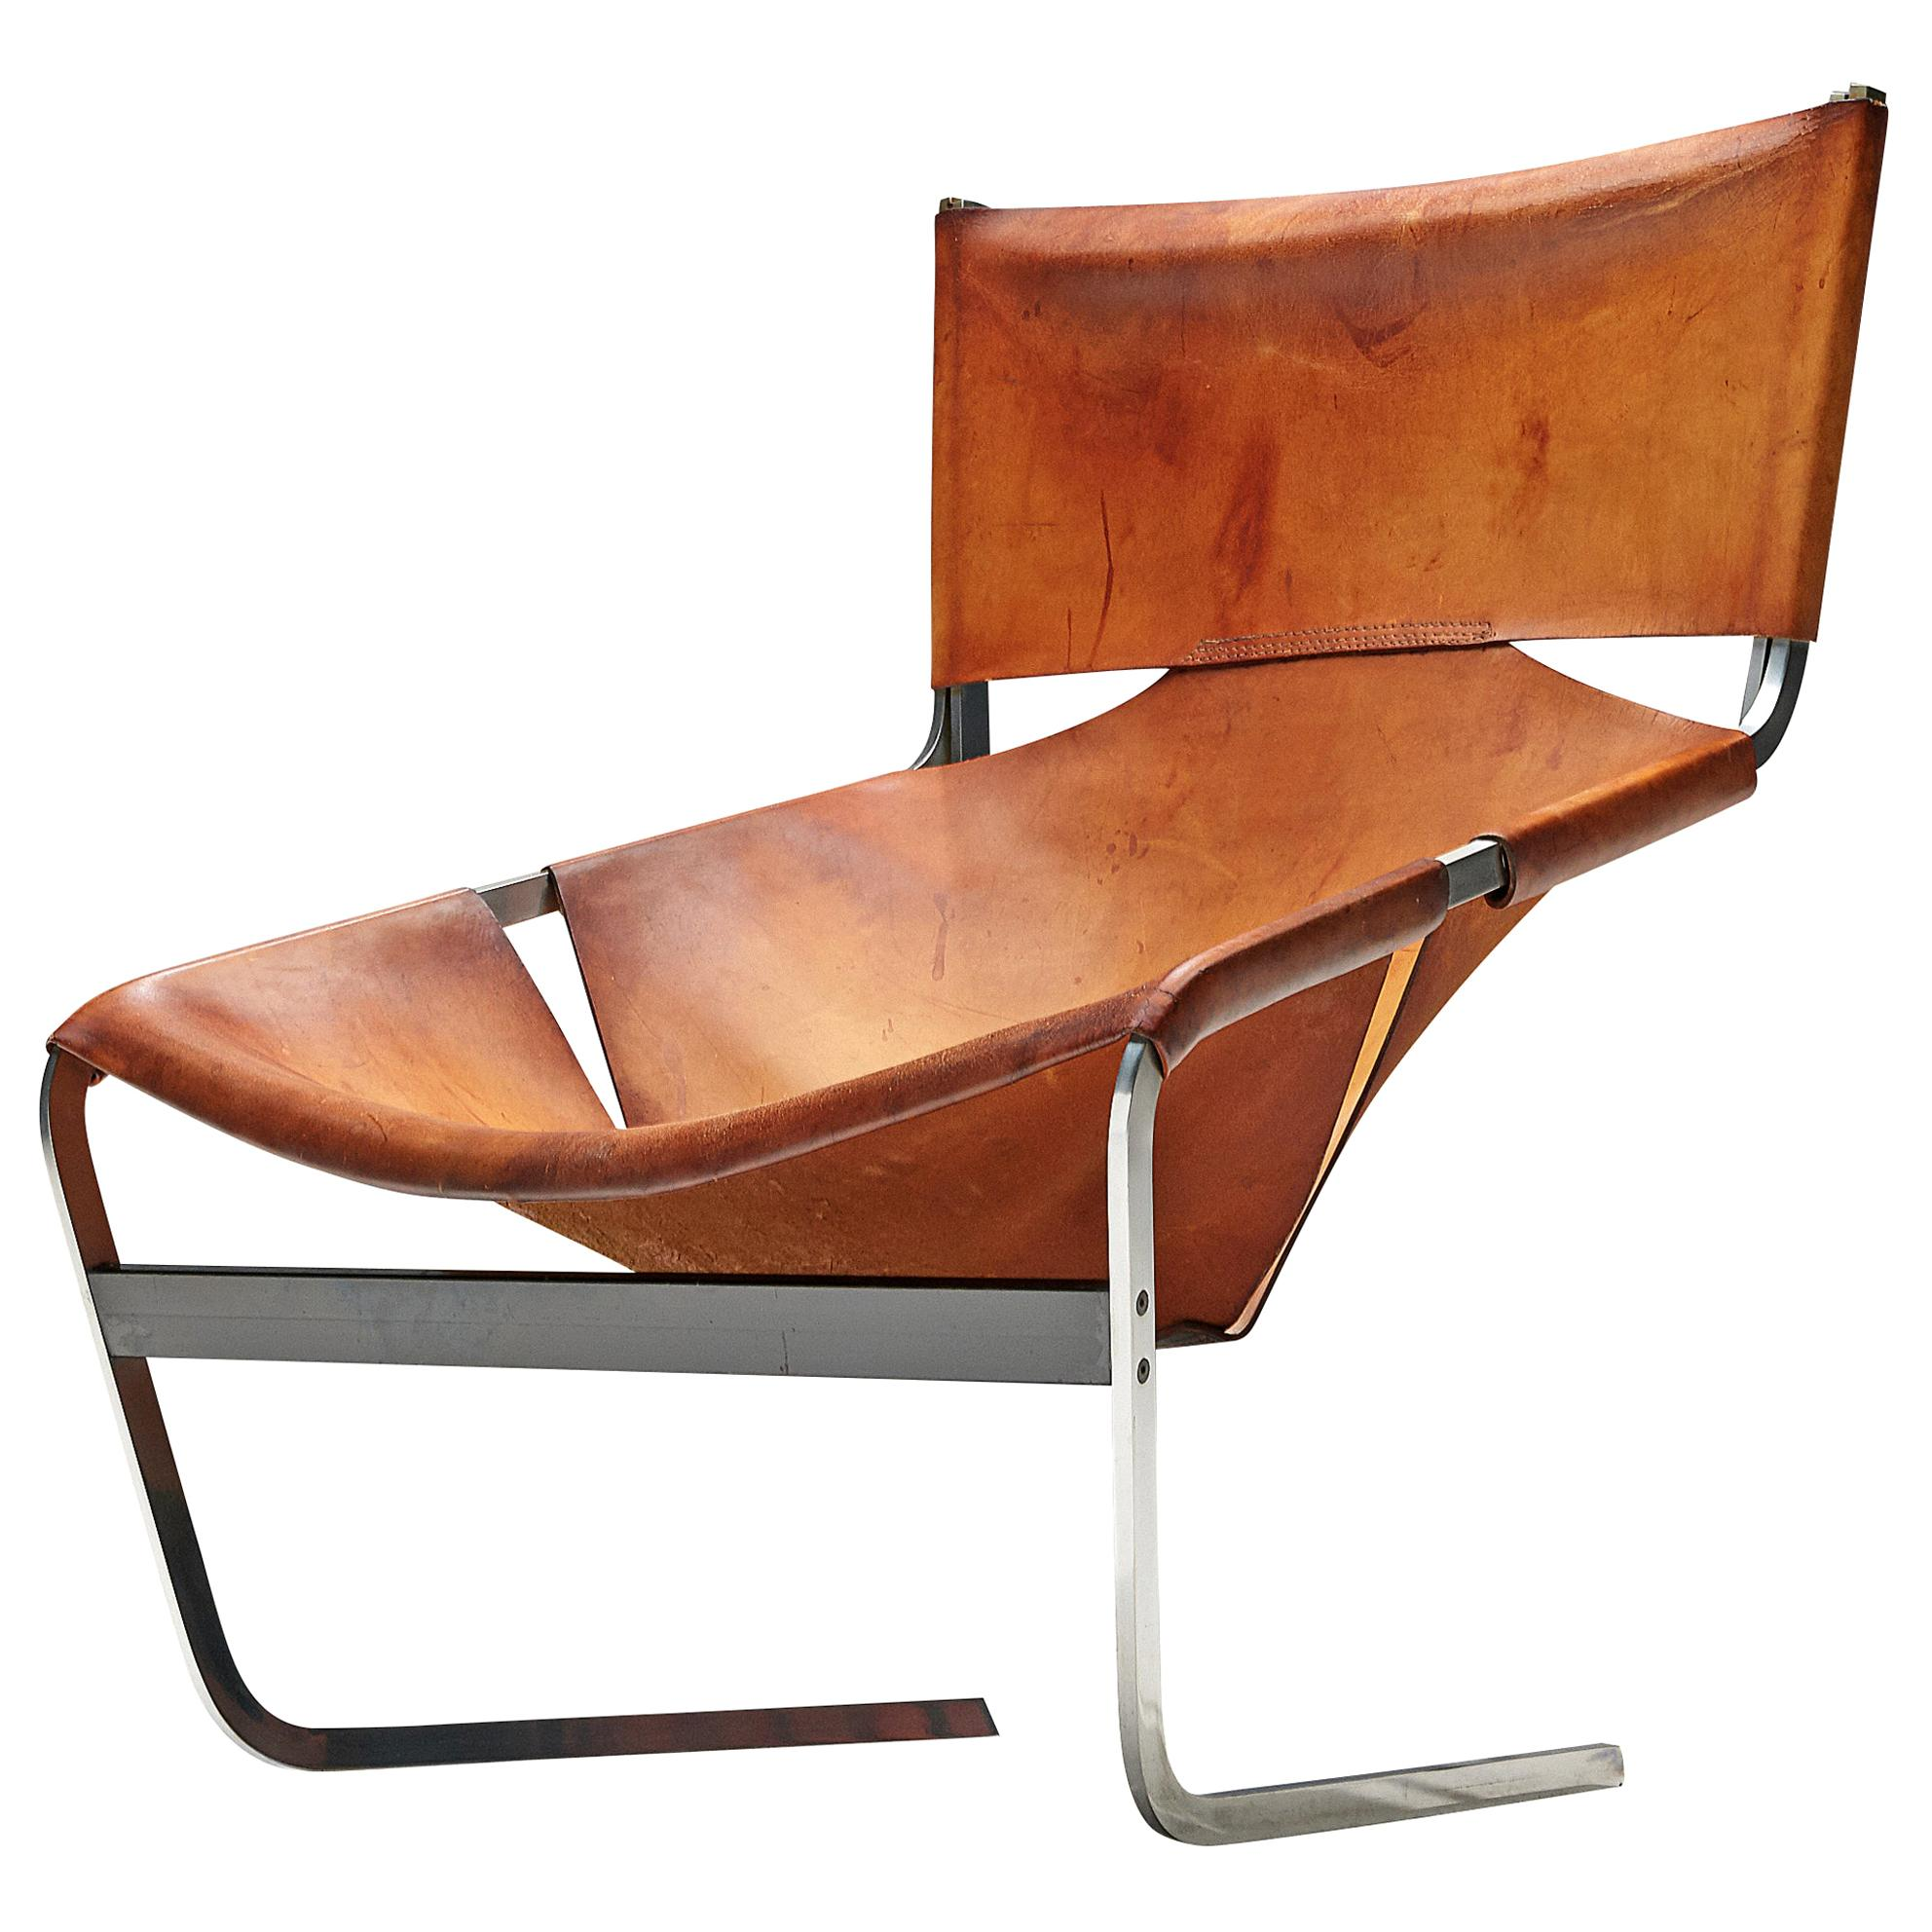 Pierre Paulin 'F-444' Easy Chair in Cognac Leather